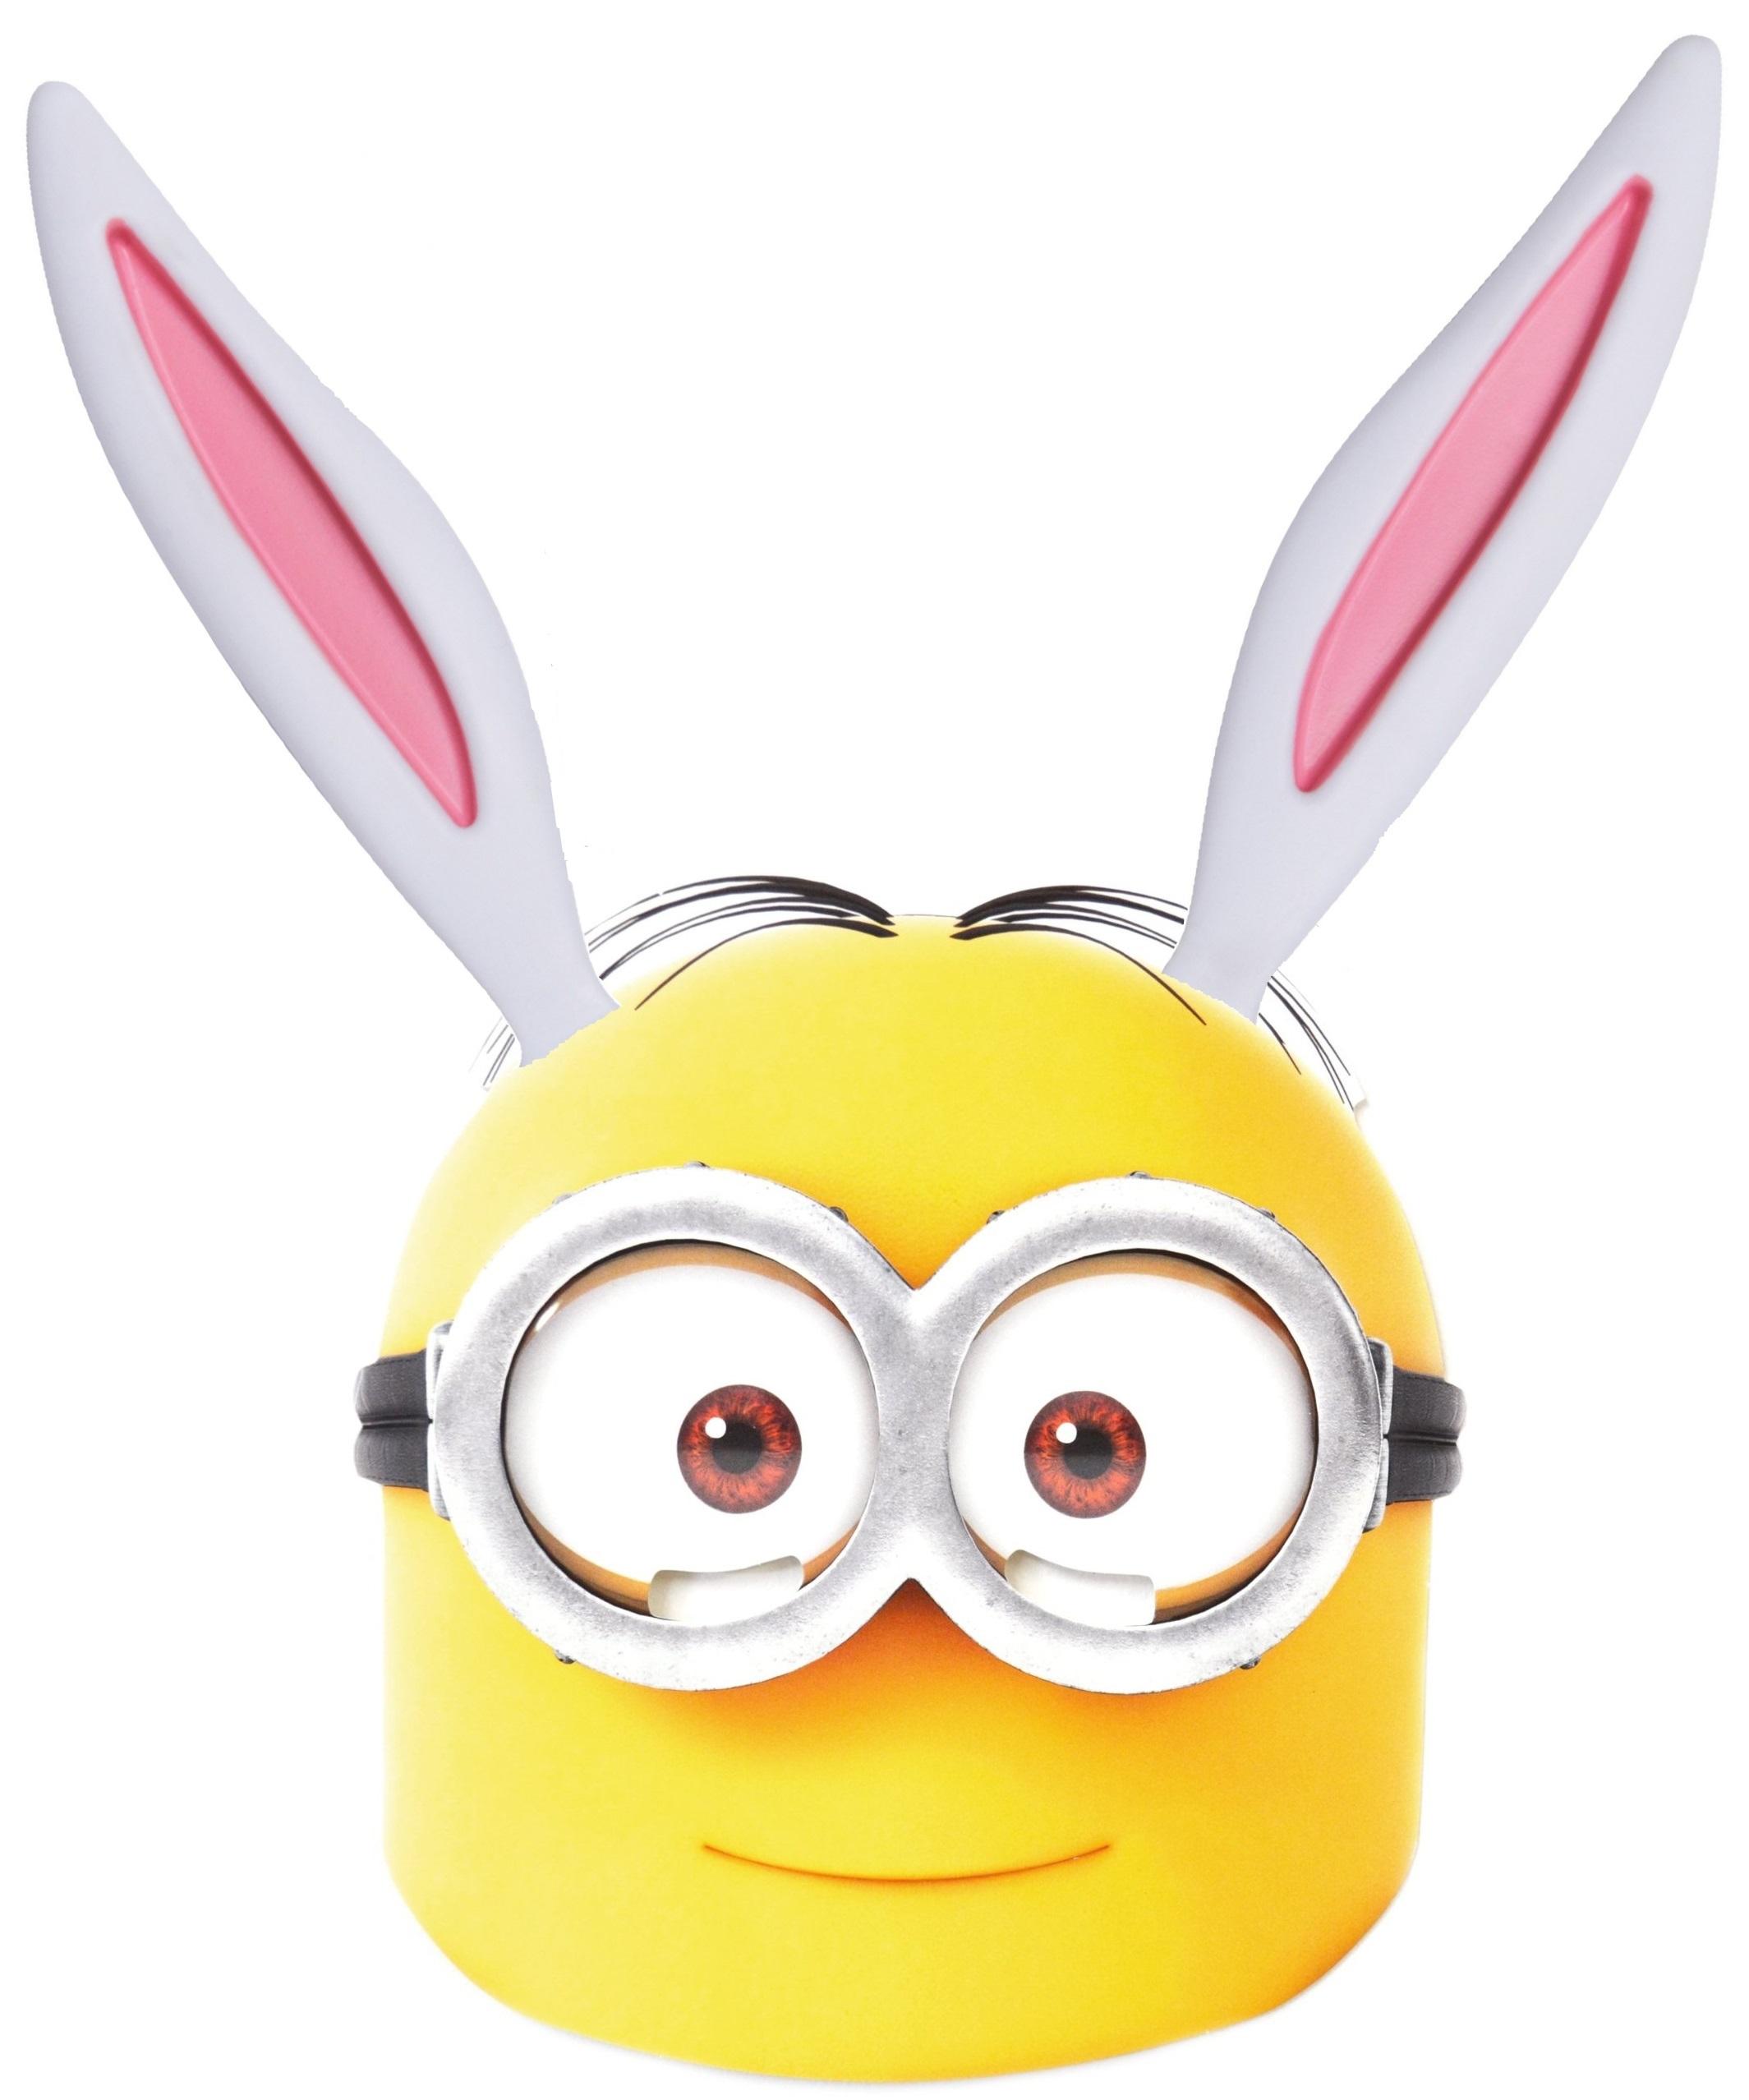 Free Easter Minion Bunny Mask Printable | Inkntoneruk Blog - Free Printable Easter Masks